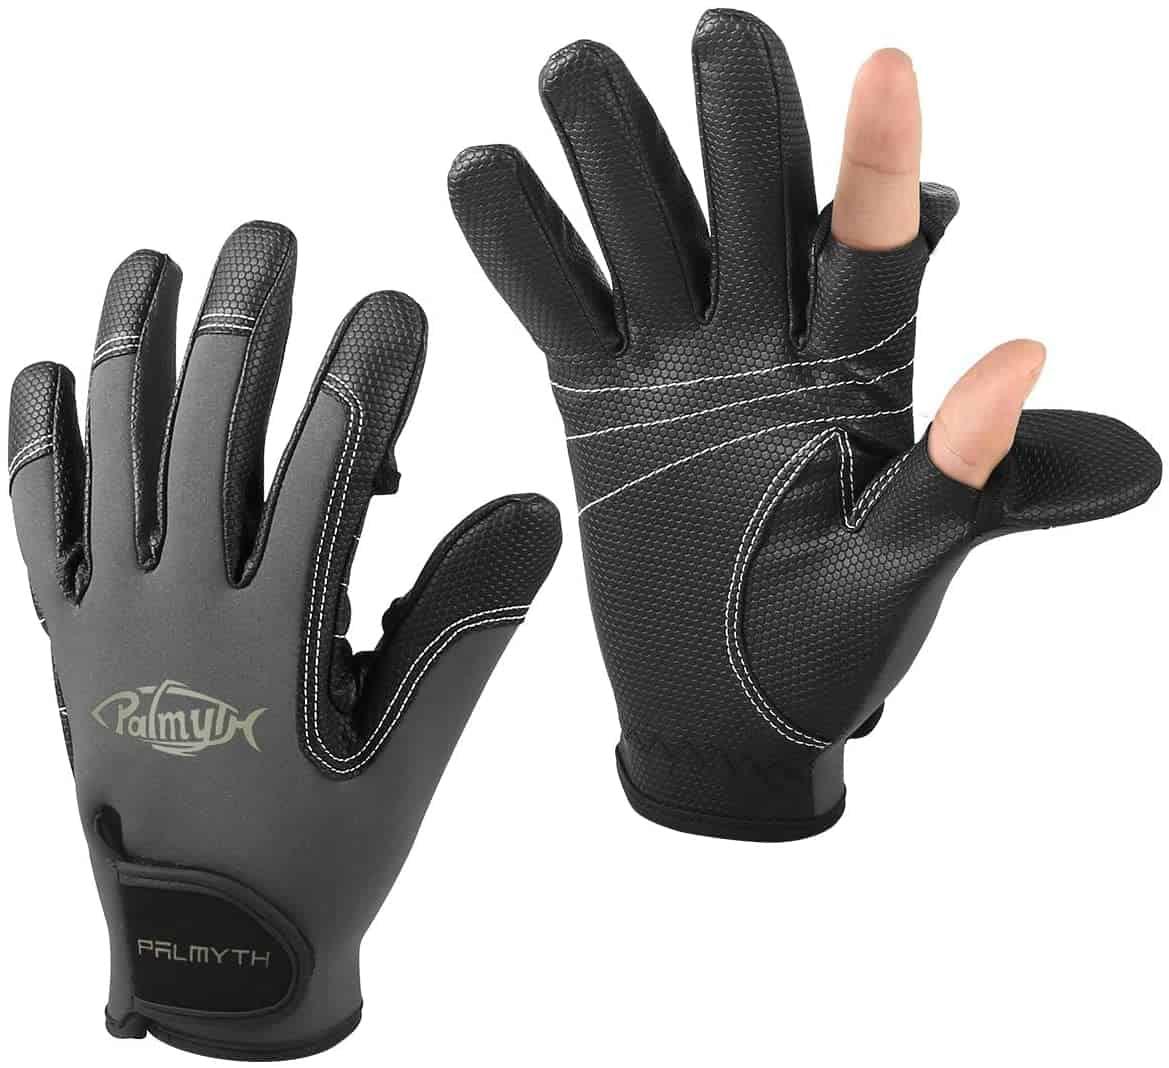 Two Cut Flexible Fishing Gloves by Palmyth